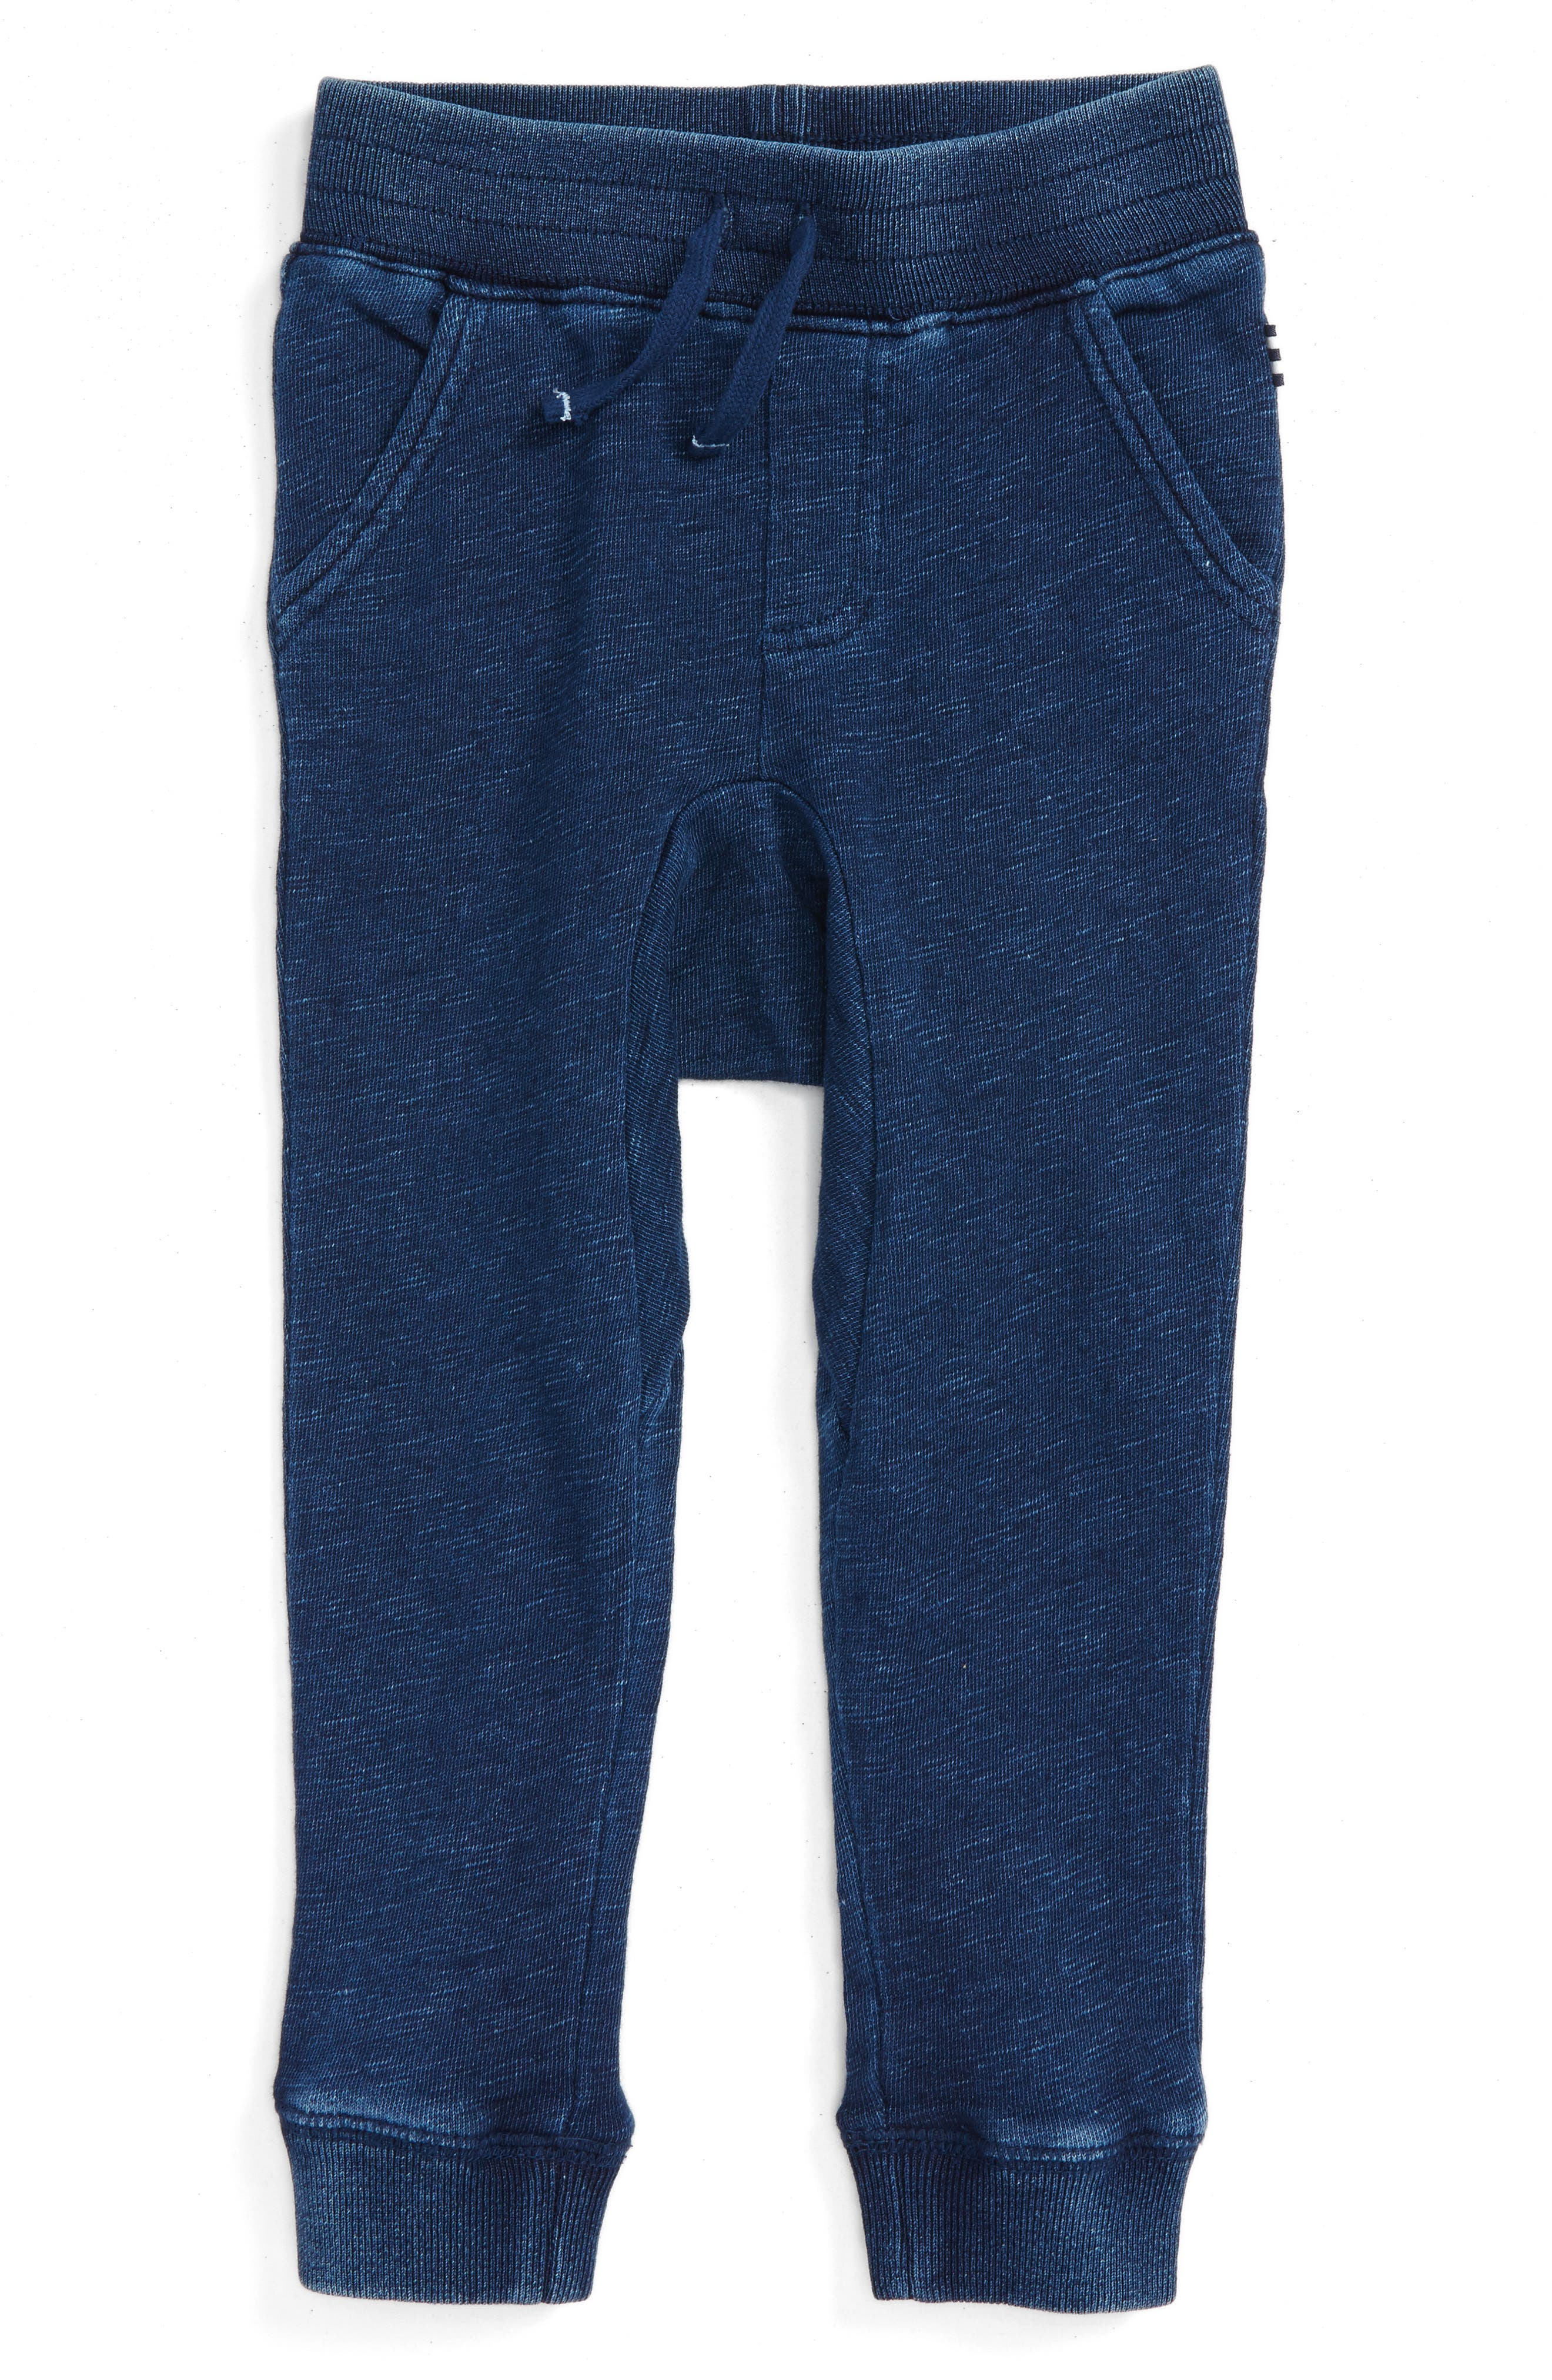 Main Image - Splendid Double Knit Jogger Pants (Toddler Boys & Little Boys)